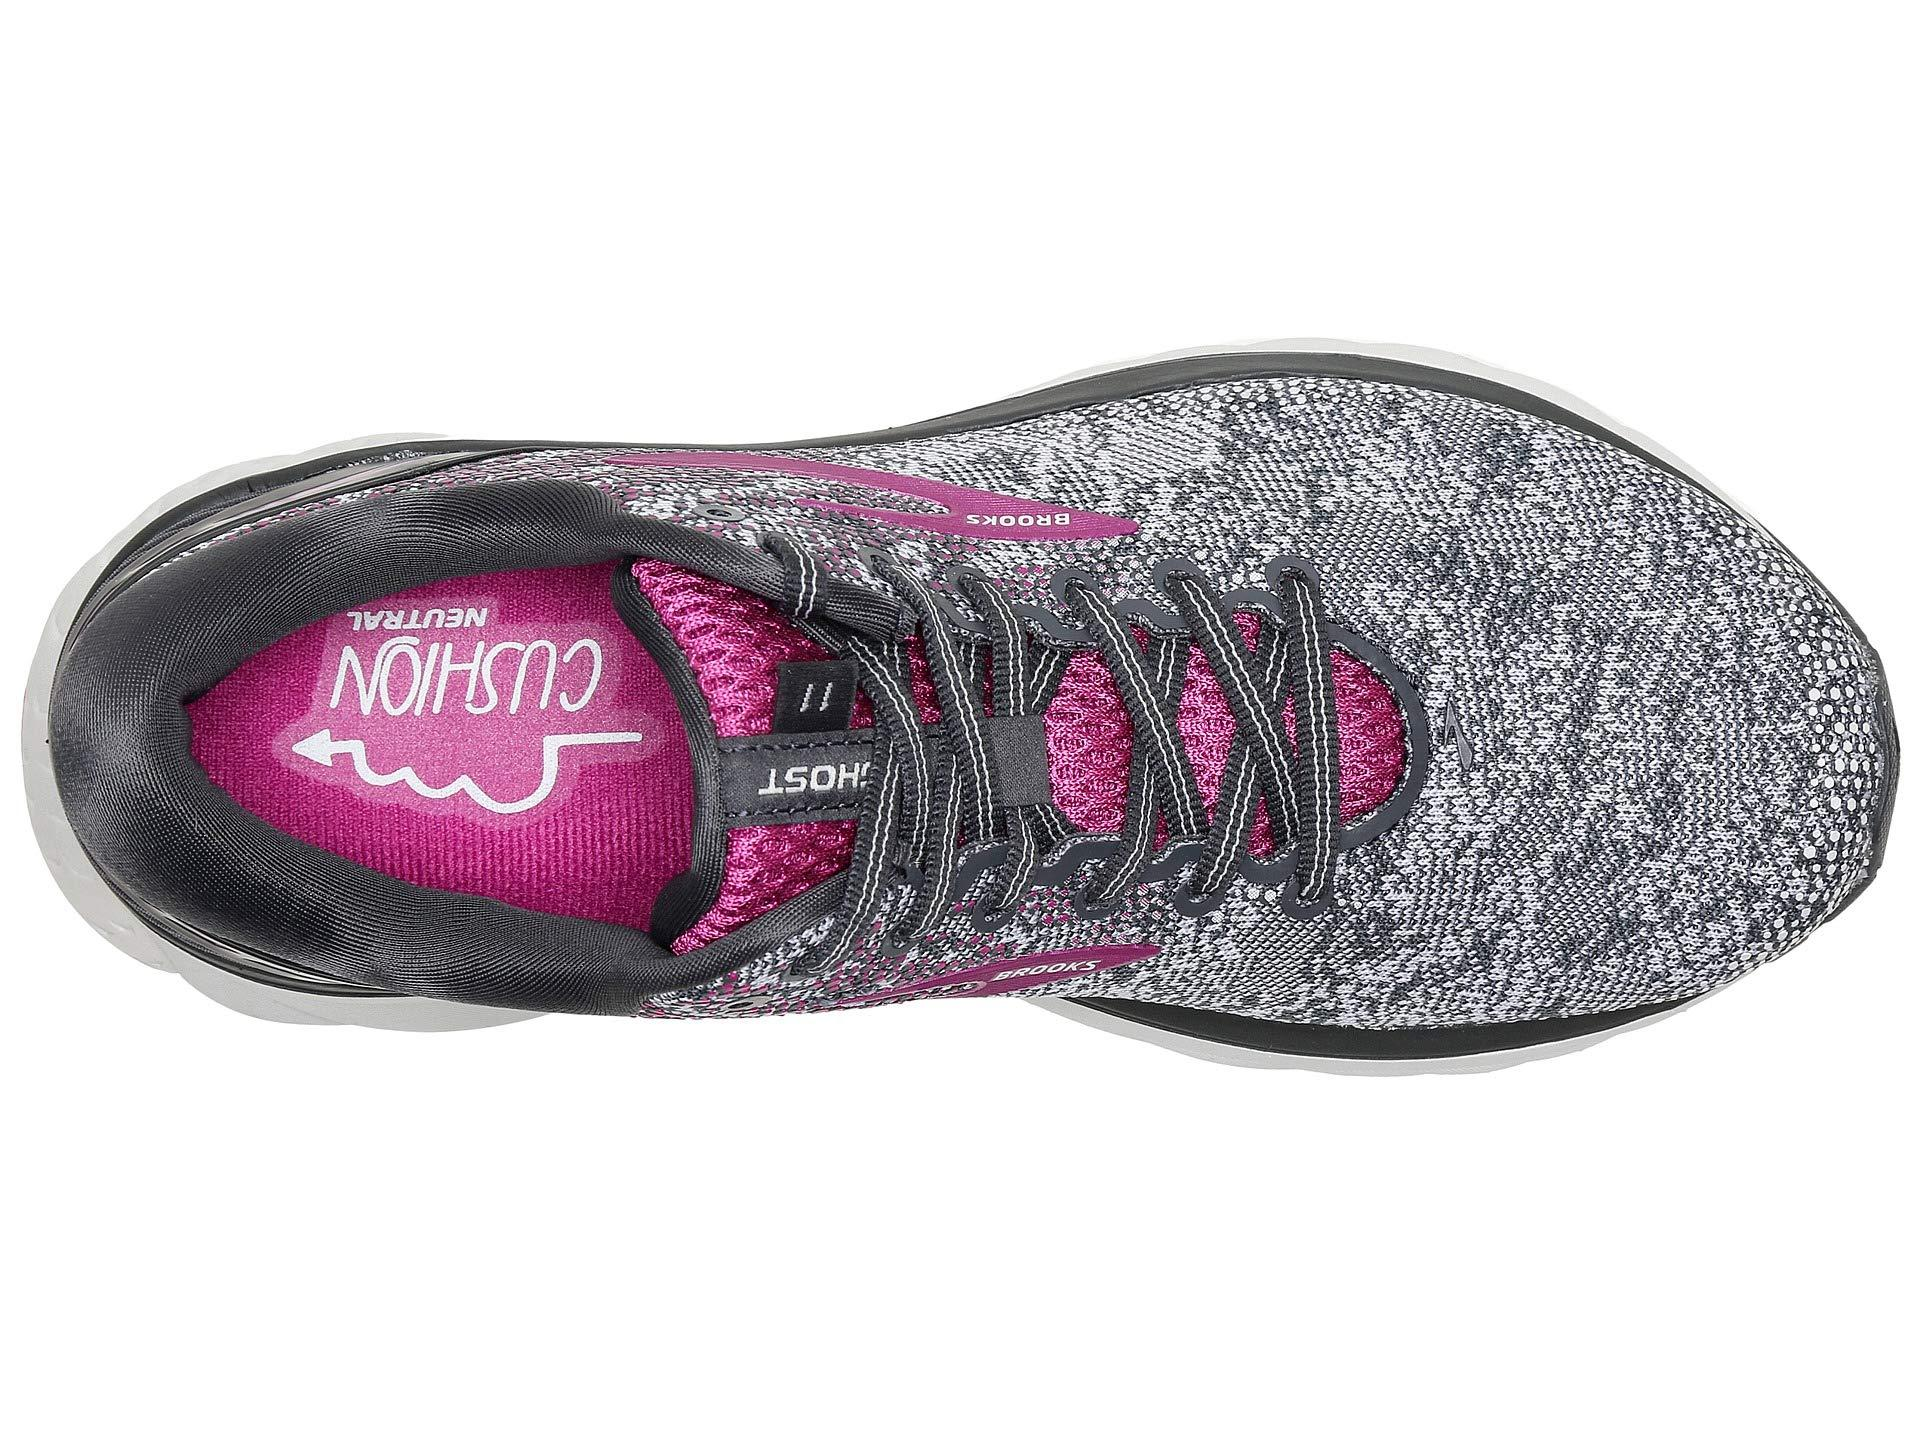 c5b774182ed Brooks - Multicolor Ghost 11 (navy grey purple Rose) Women s Running Shoes.  View fullscreen